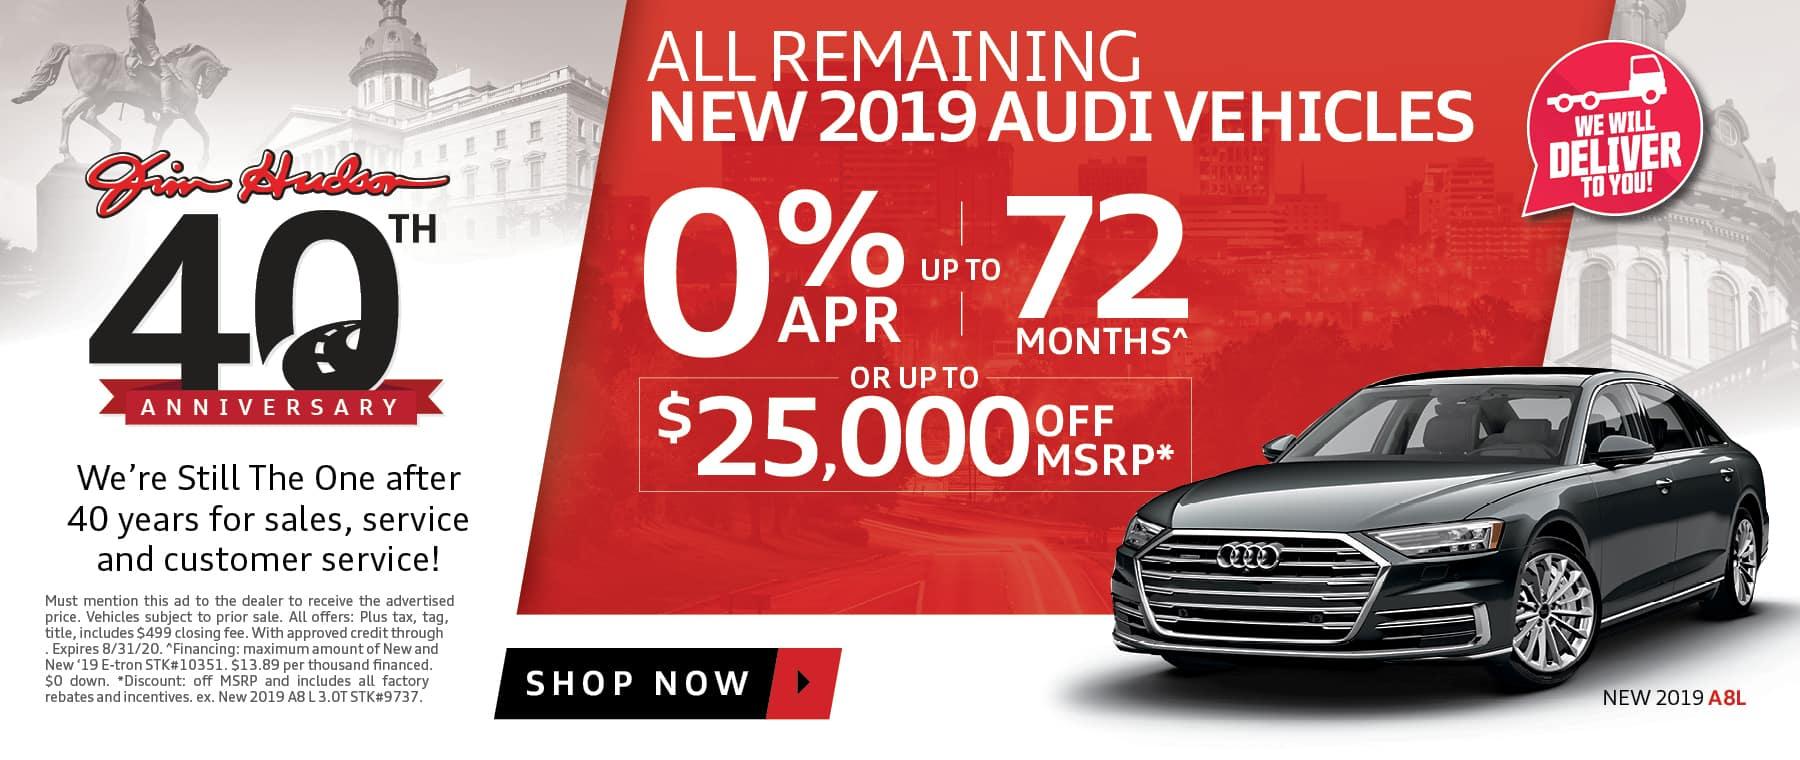 2019 Audi vehicles